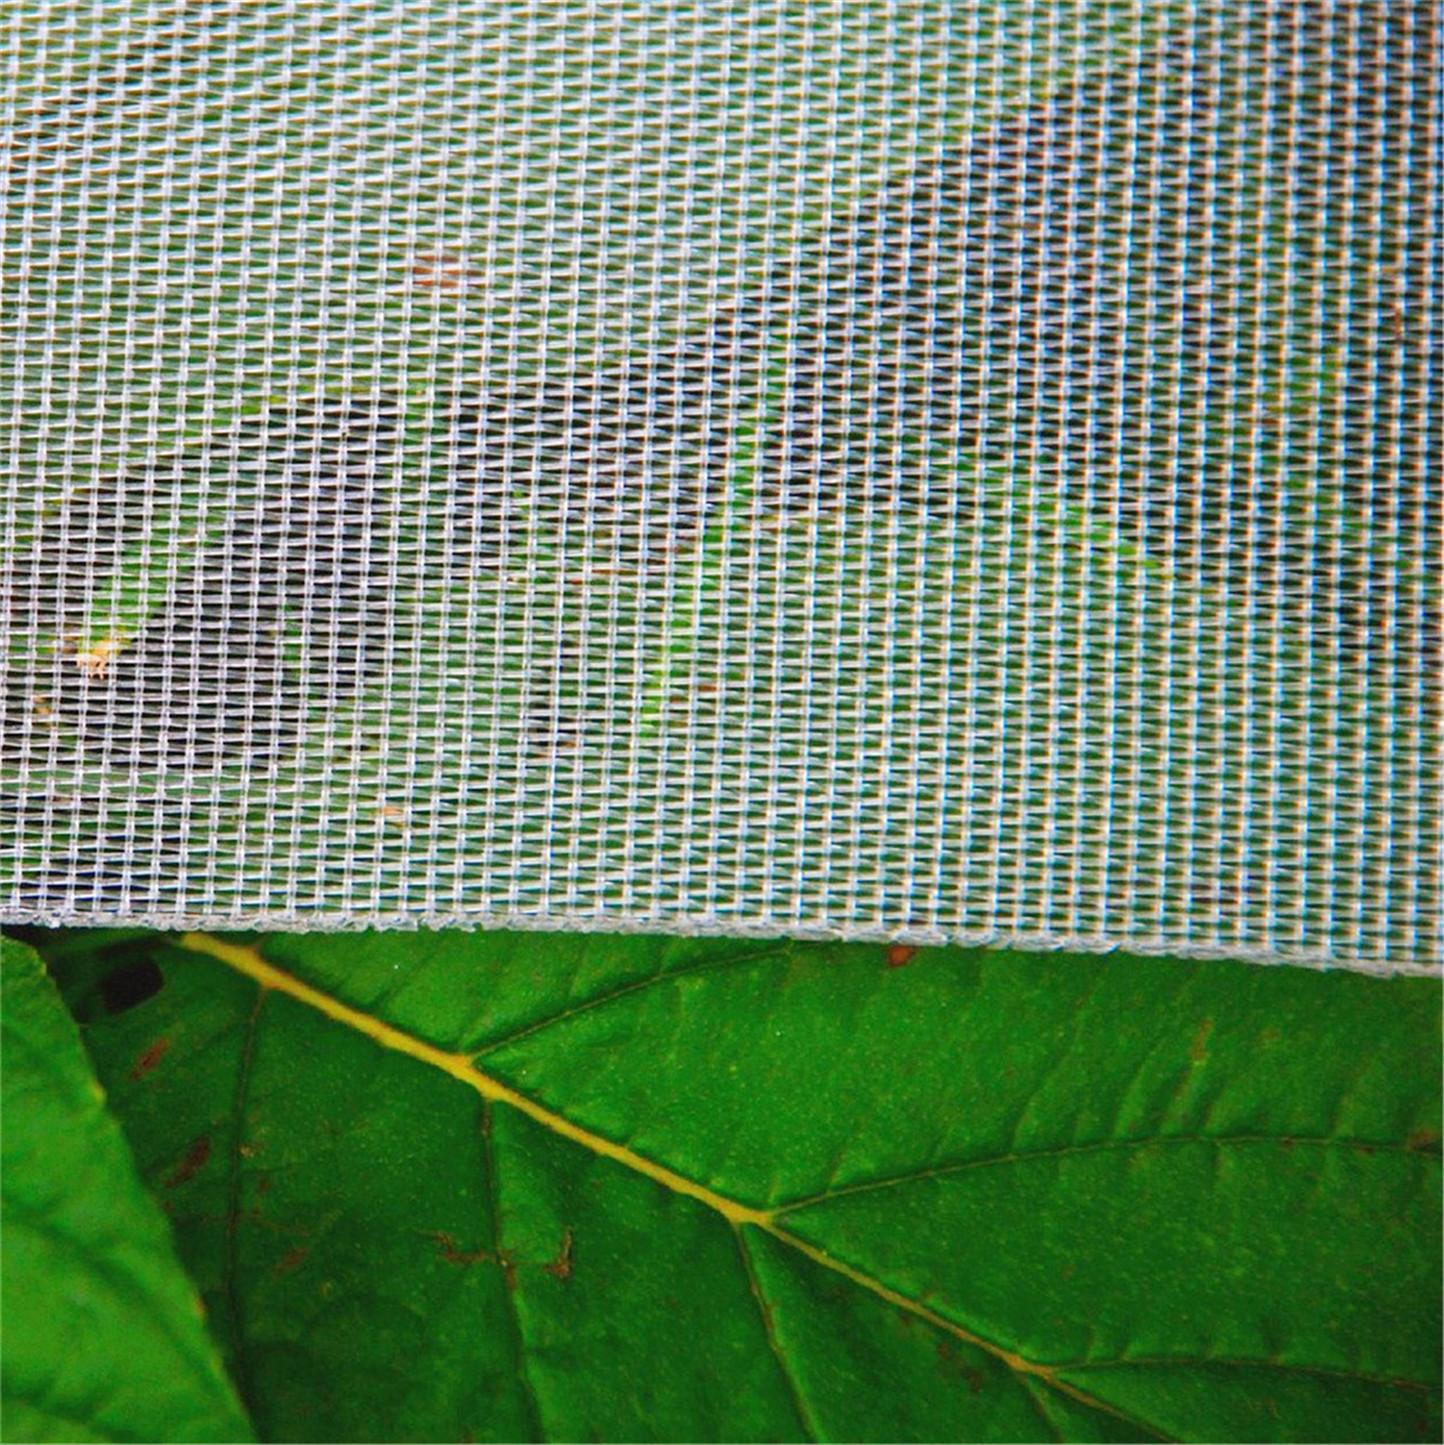 Hausgarten Gemüse Blumengarten Obstgarten Anti-Vogel Anti-Insekten-Netz